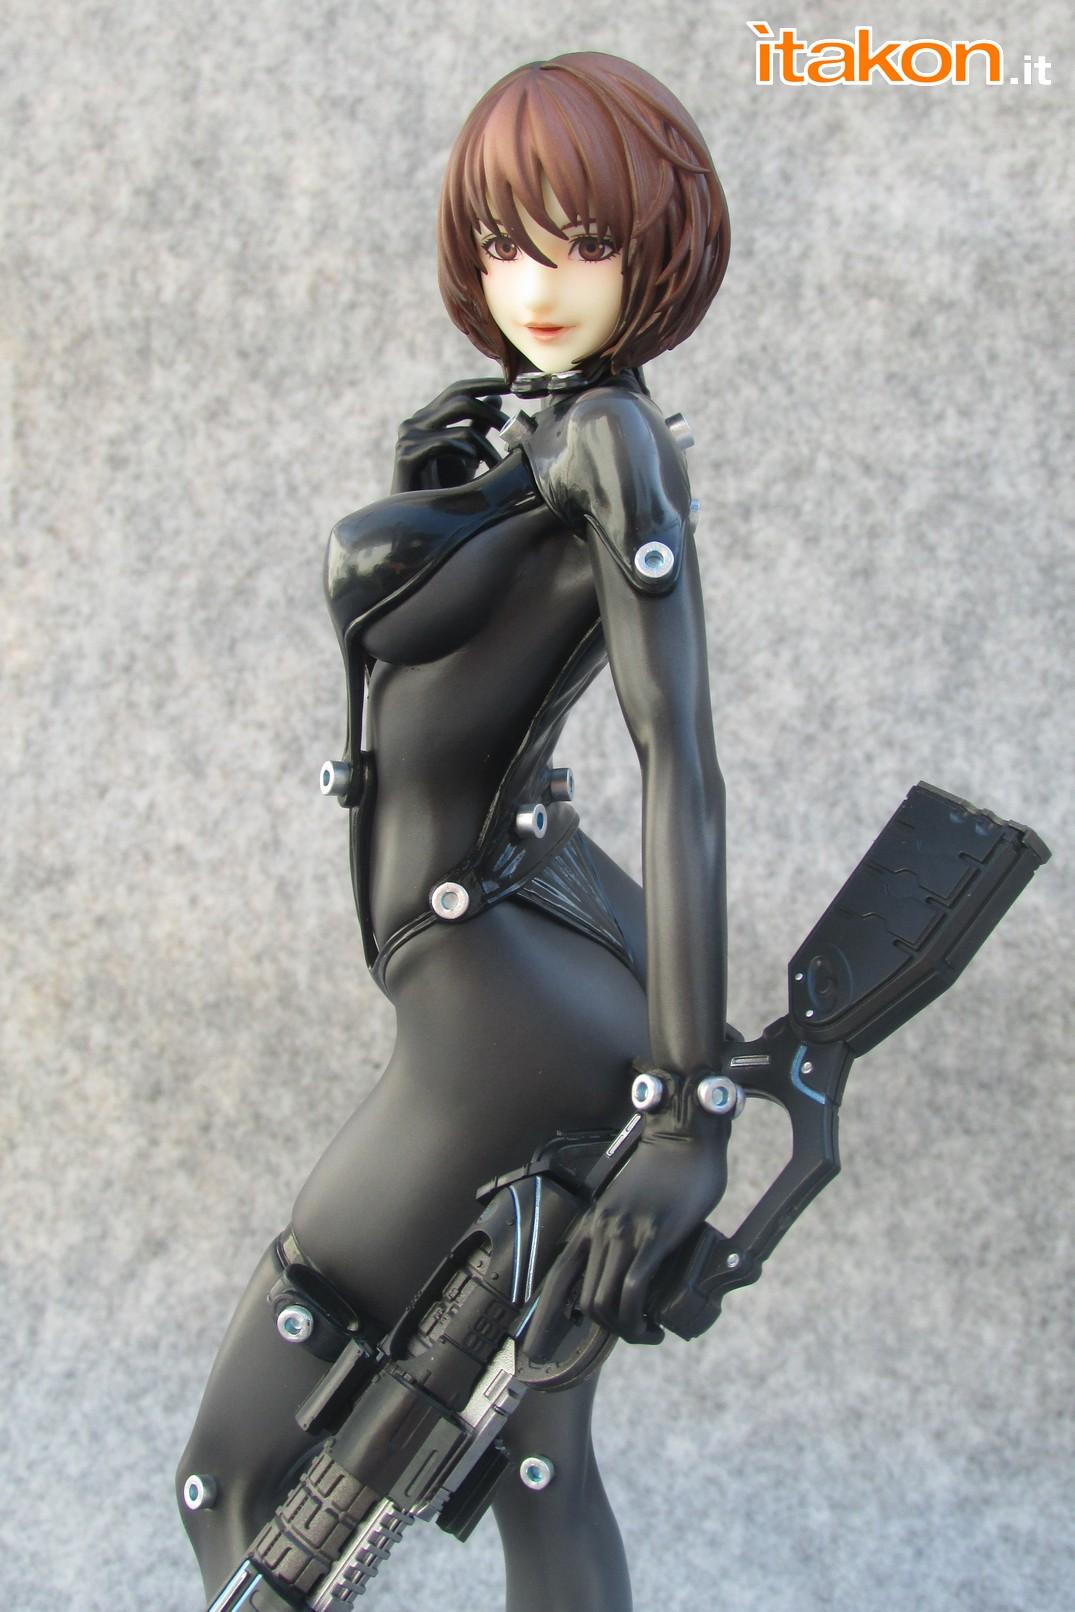 Link a Recensione review Yamasaki Anzu X Shotgun ver. da Gantz 0 di Union Creative International Ltd Itakon.it 45